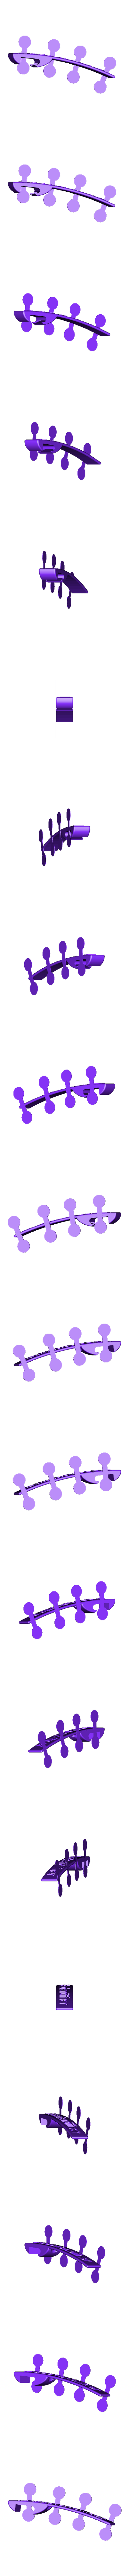 Flaschenoeffner_V1.1-Flaschen%C3%B6ffner.stl Télécharger fichier STL gratuit Décapsuleur v1.1 • Plan imprimable en 3D, dede67